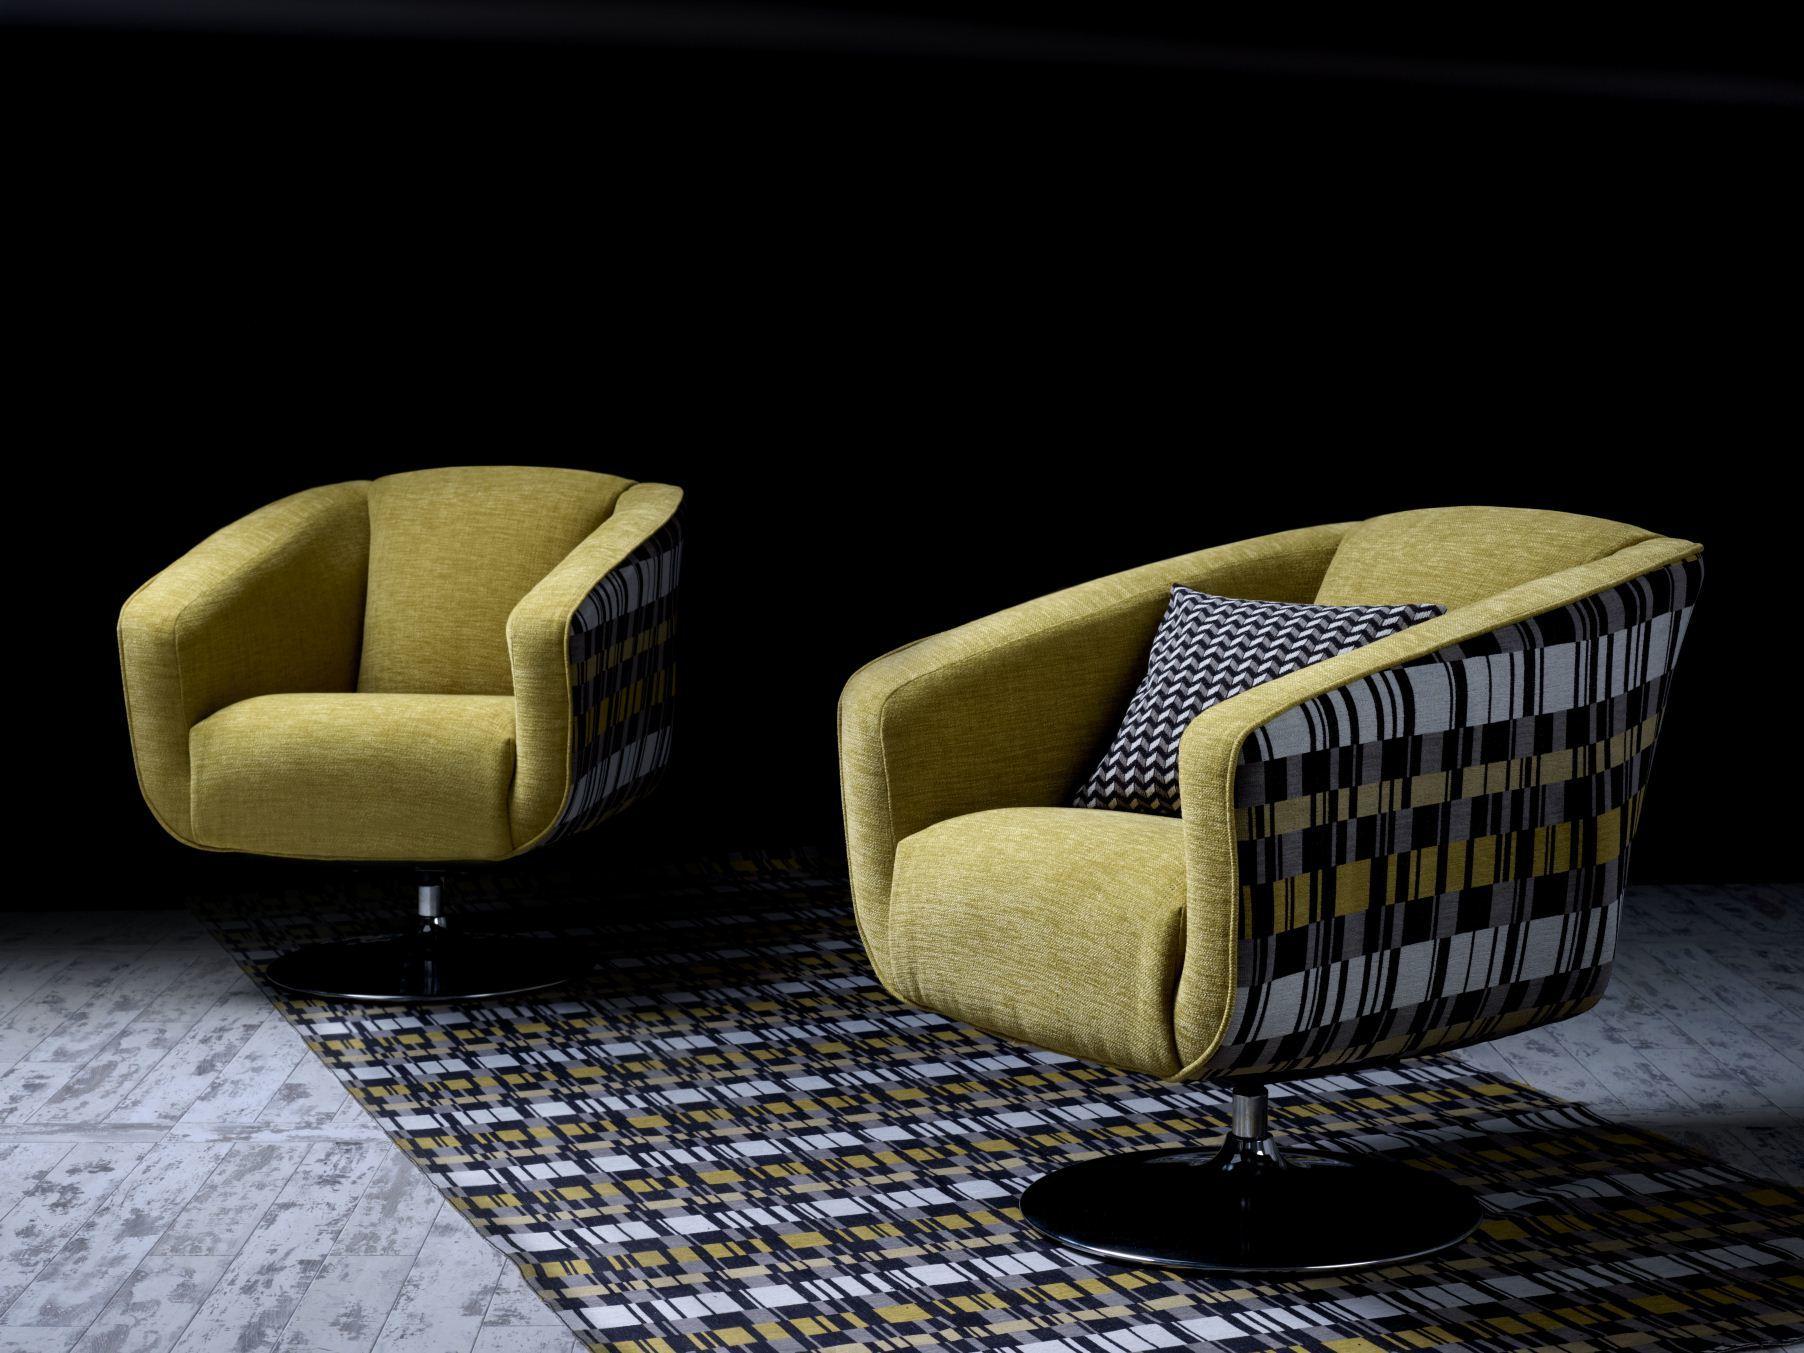 Geometry Marco Rhombus Chair3